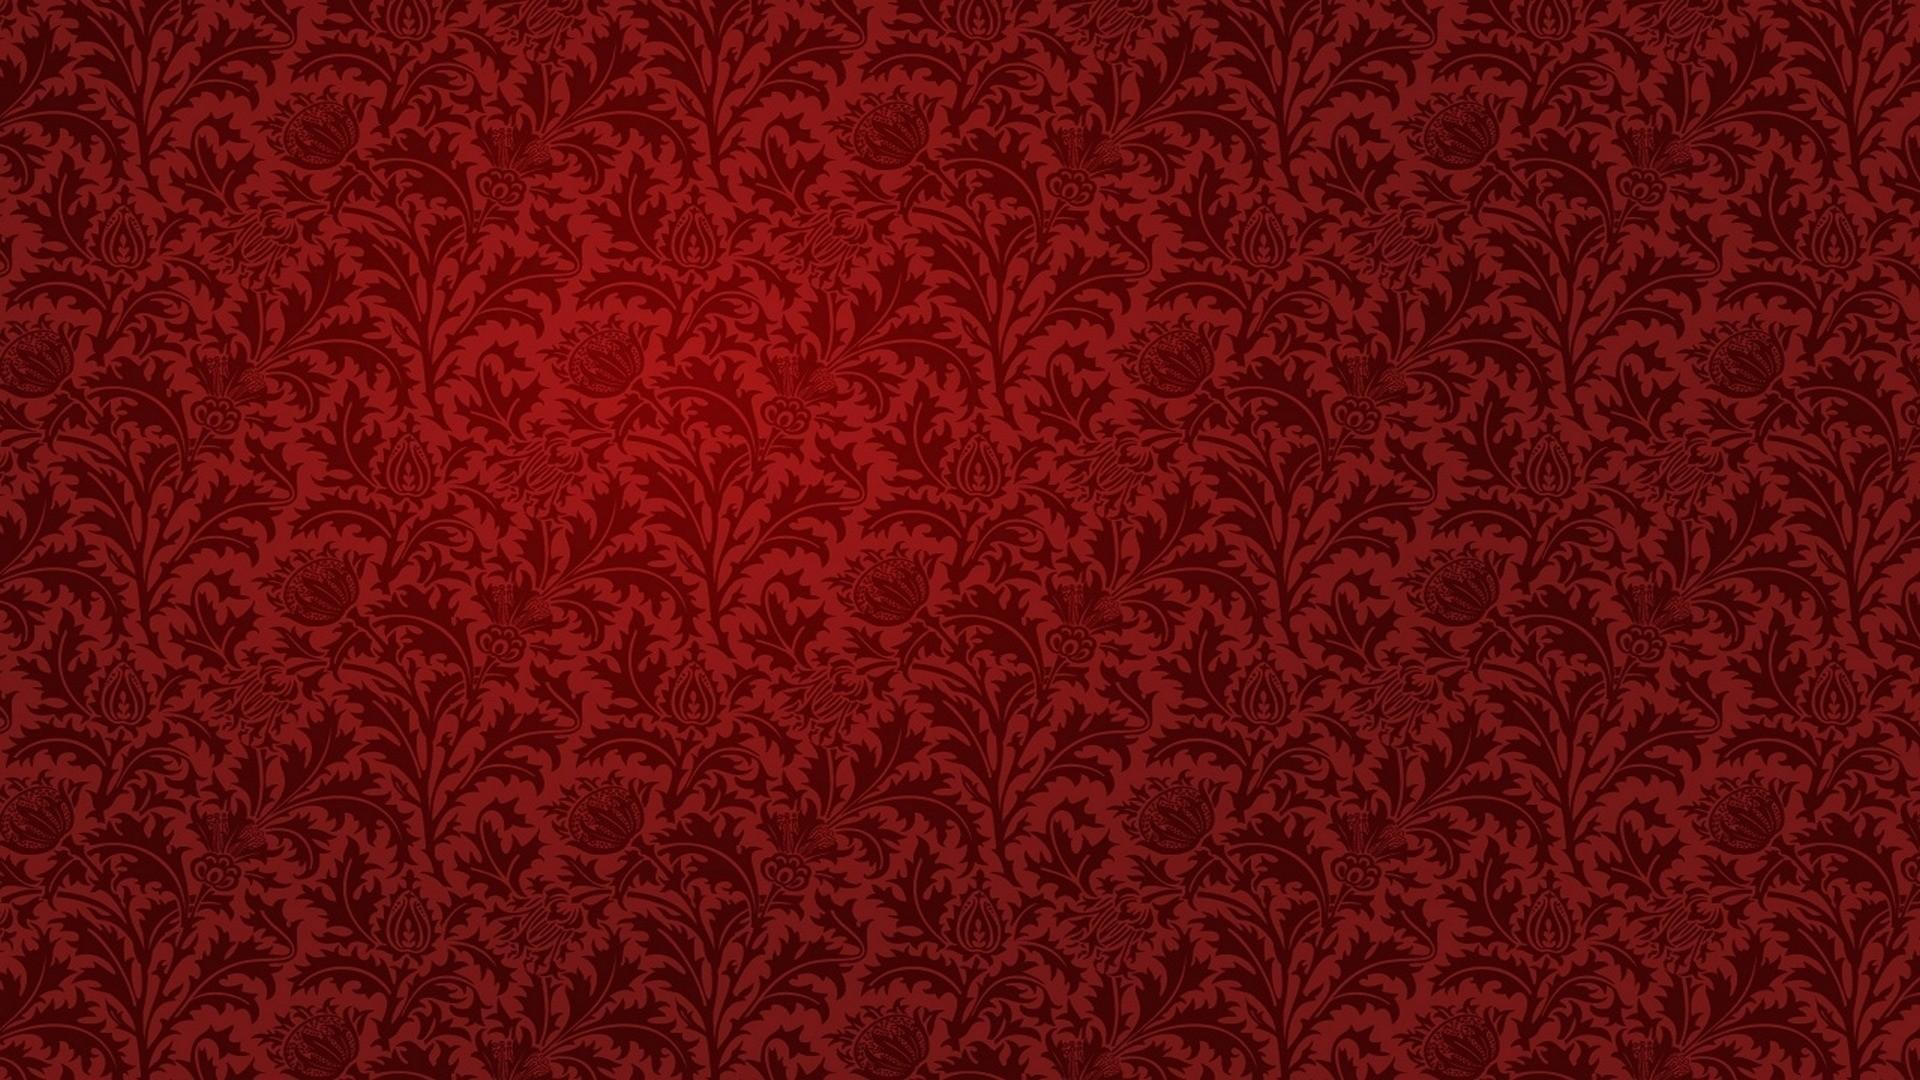 patterns_lines_bright_color_surface_texture_50511_1920x1080.jpg (1920×1080)  | Hintergründe | Pinterest | Wallpaper